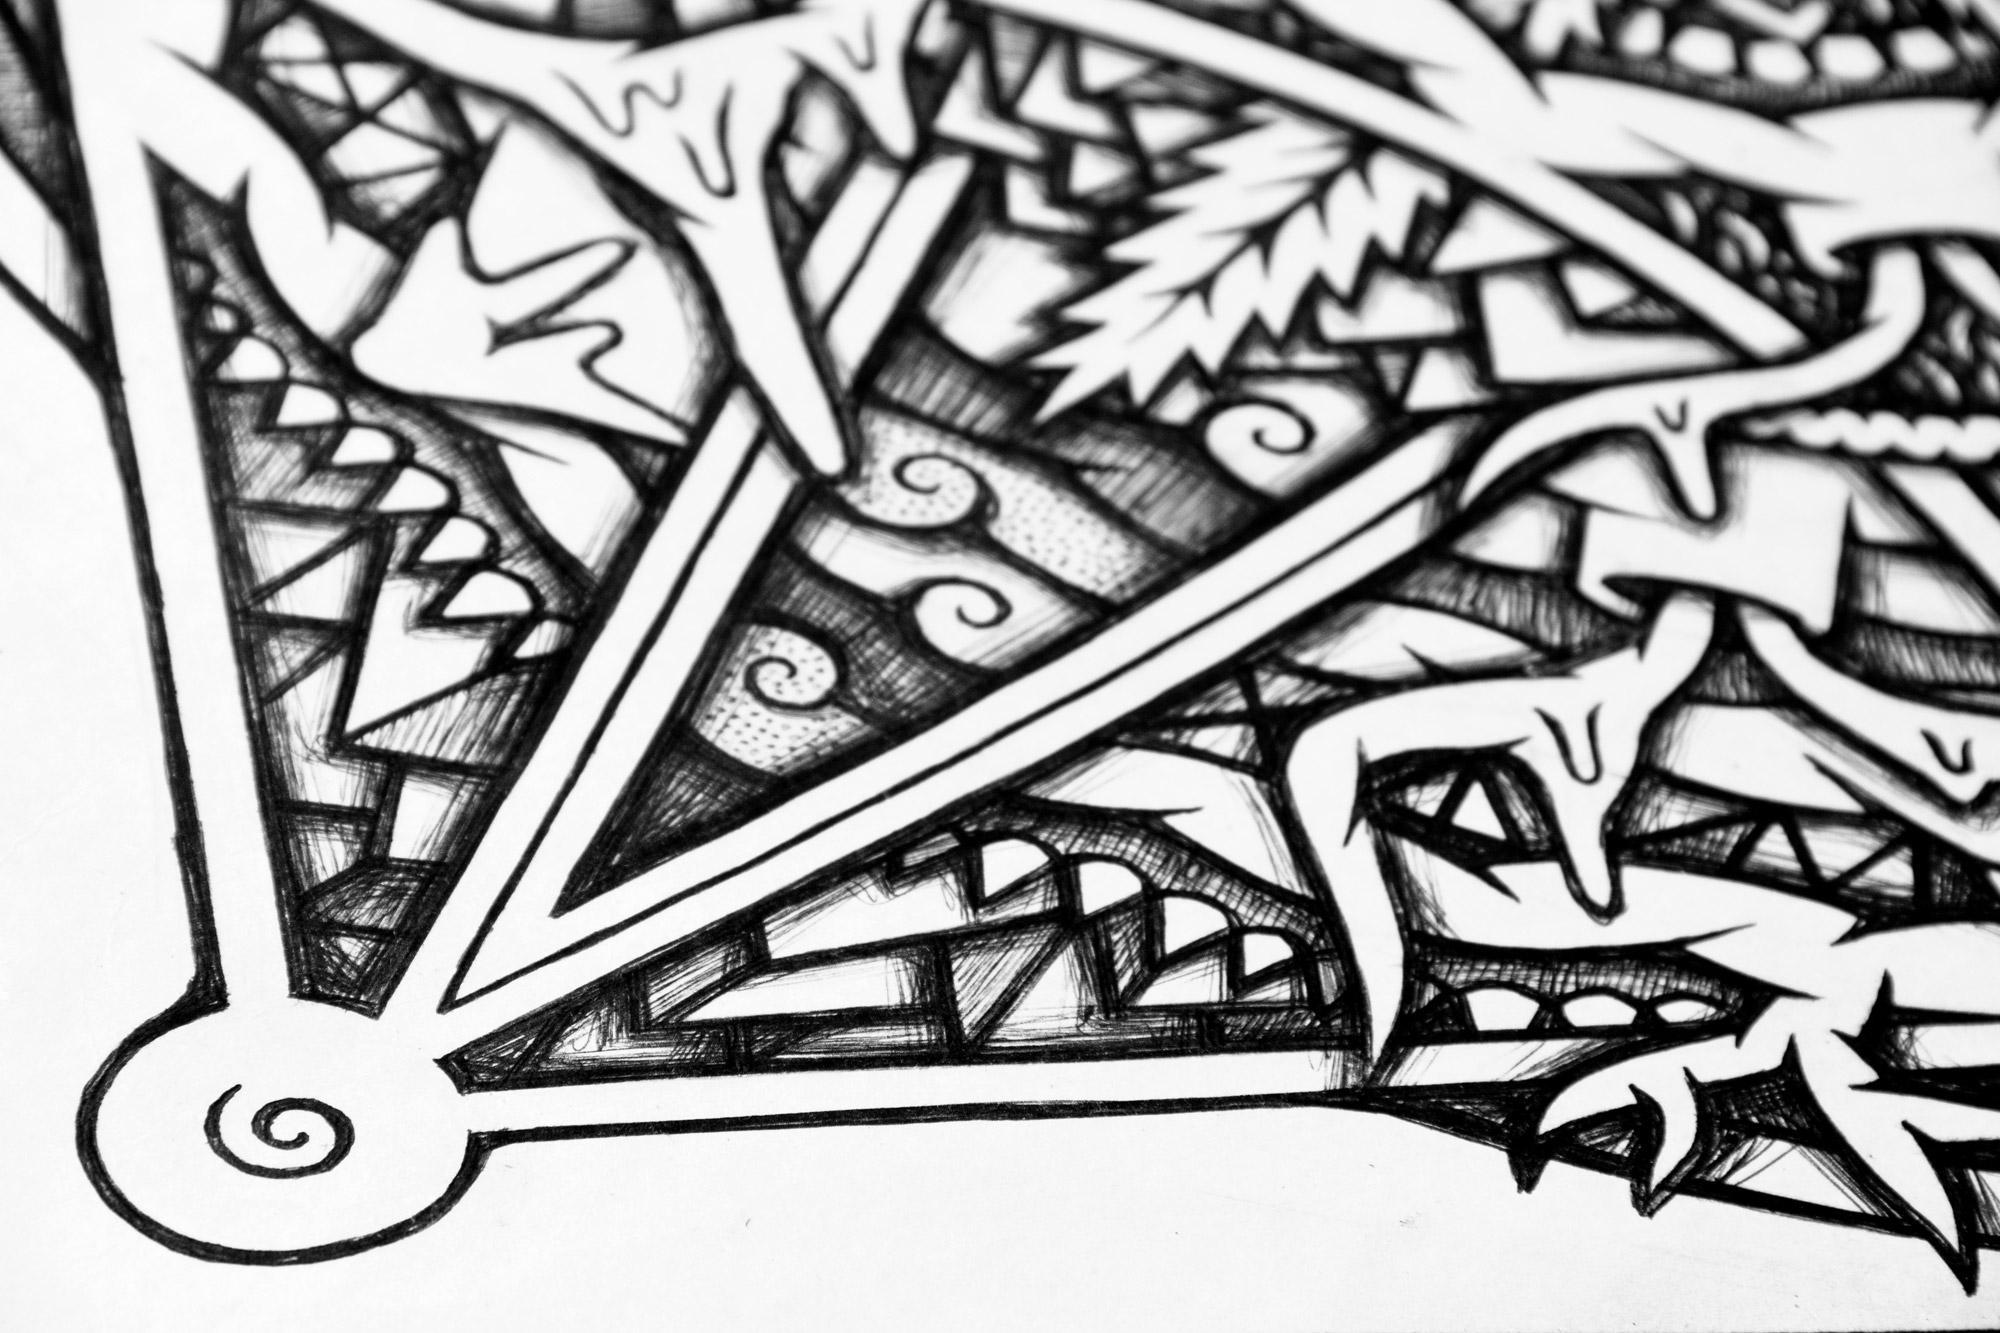 mandala-intero-elements-detail2